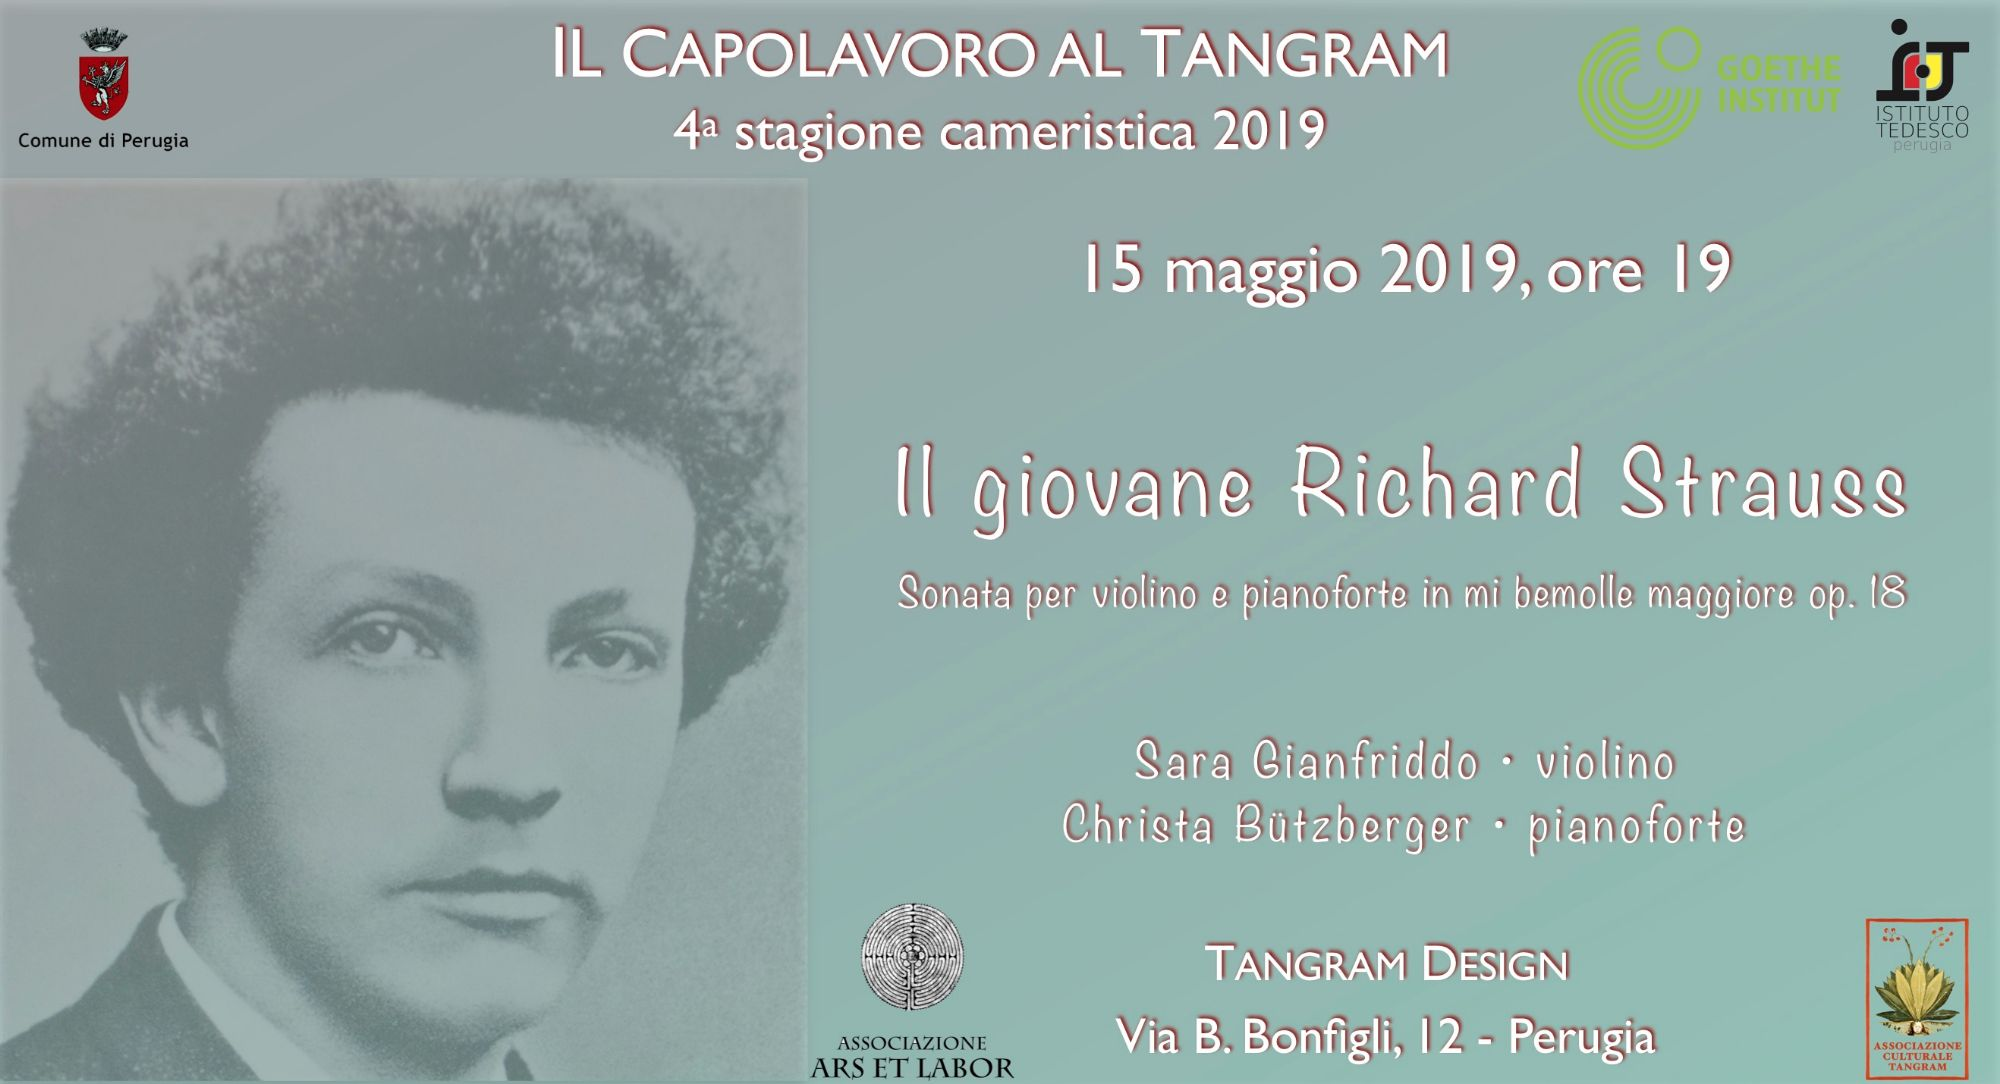 Il giovane Richard Strauss a